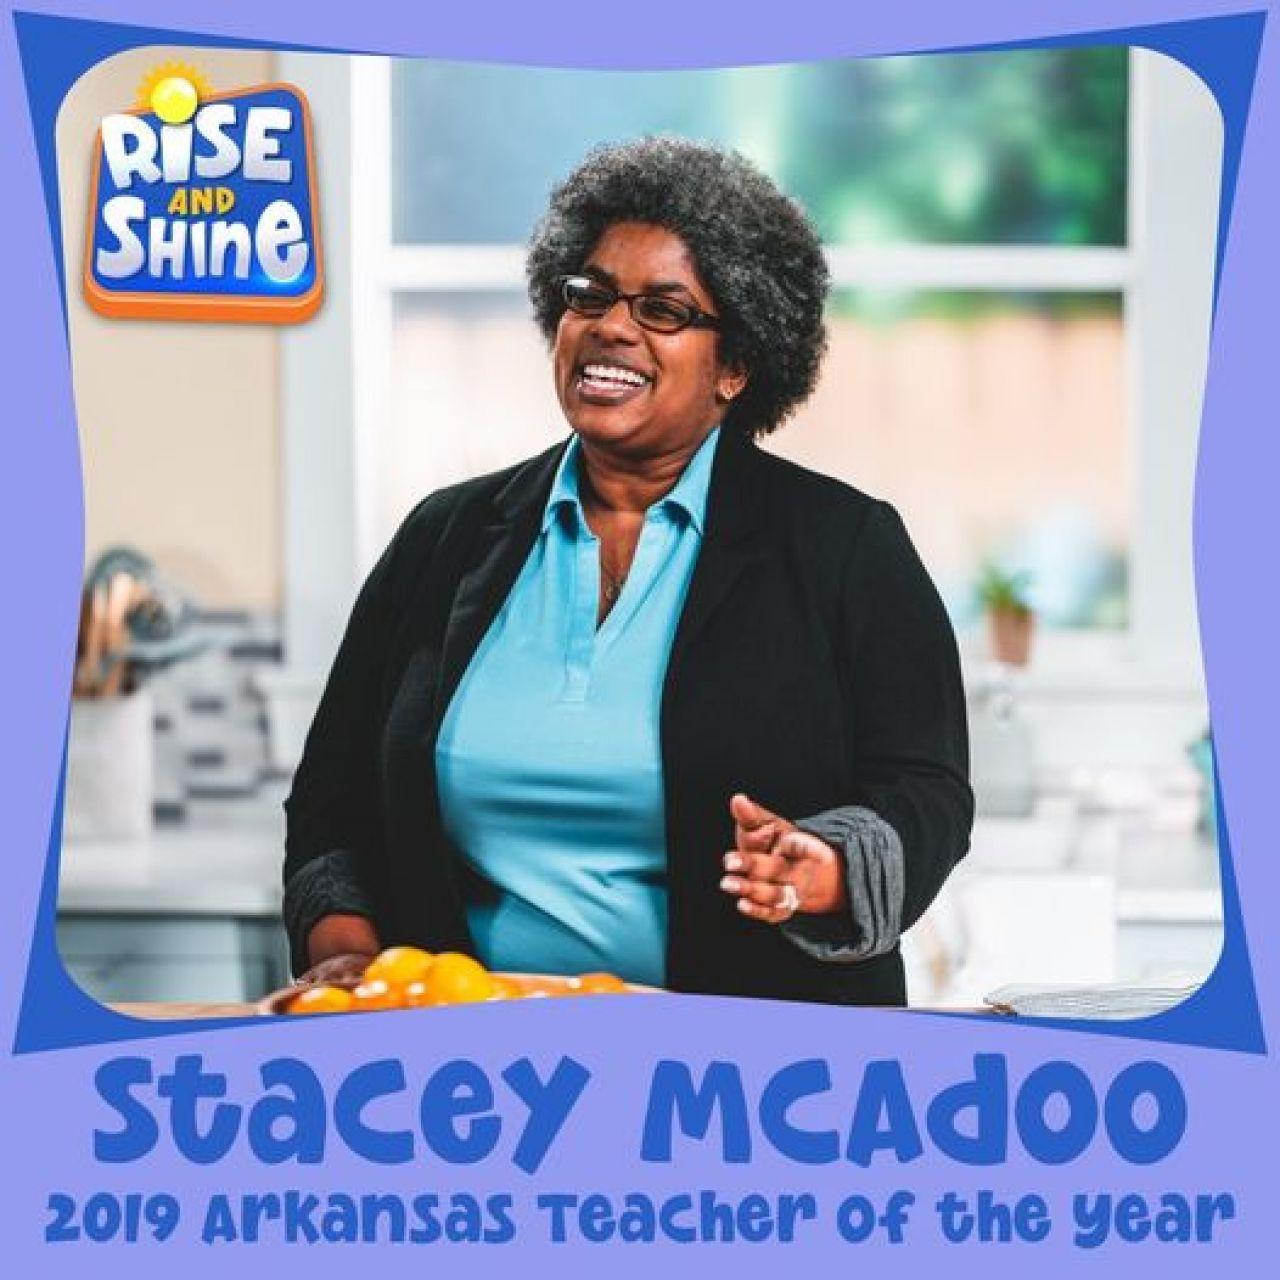 2019 Arkansas Teacher of the Year Stacey McAdoo